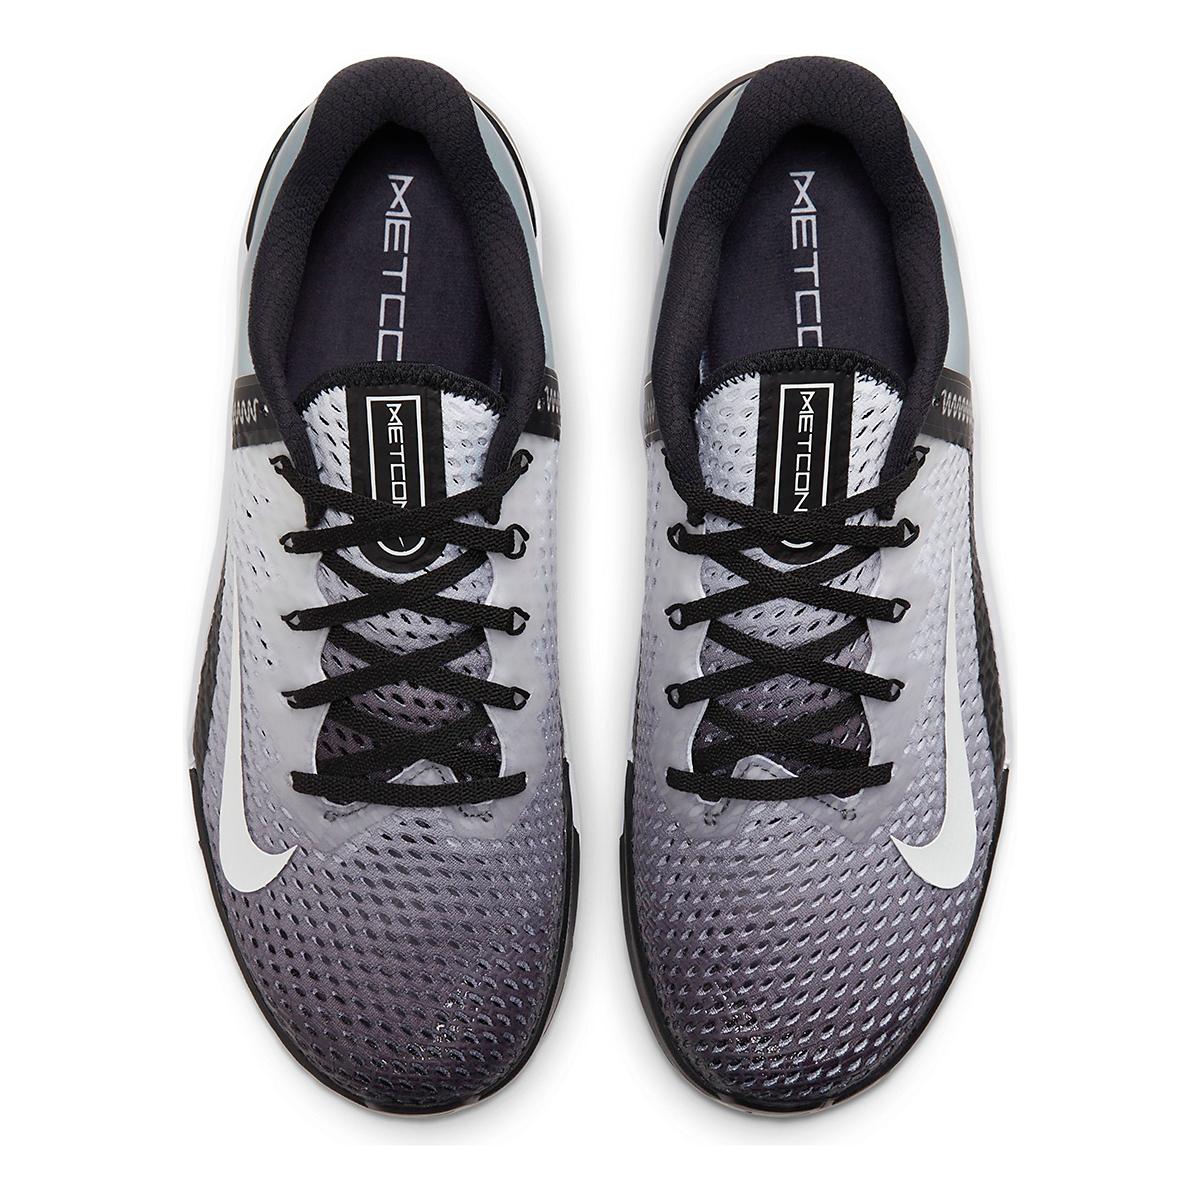 Men's Nike Metcon 6 Training Shoe - Color: Black/White - Size: 4 - Width: Regular, Black/White, large, image 6